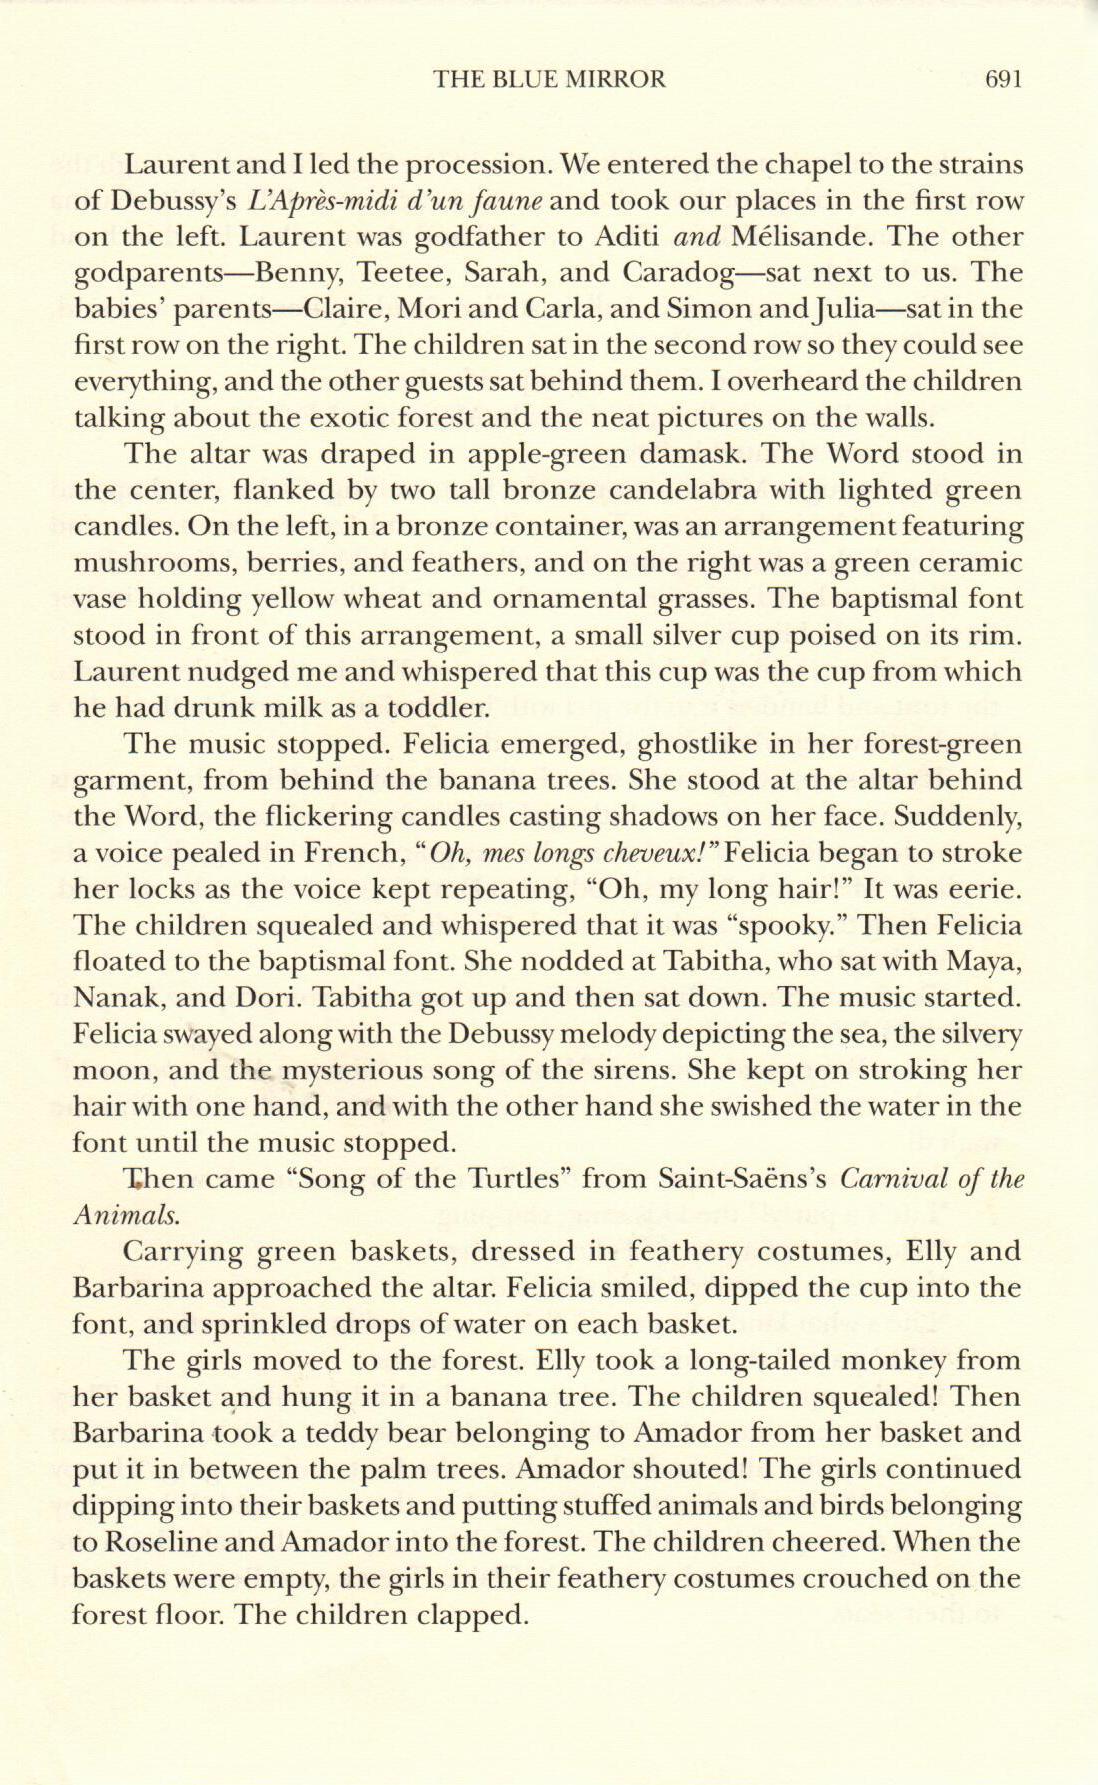 page_691_TBM